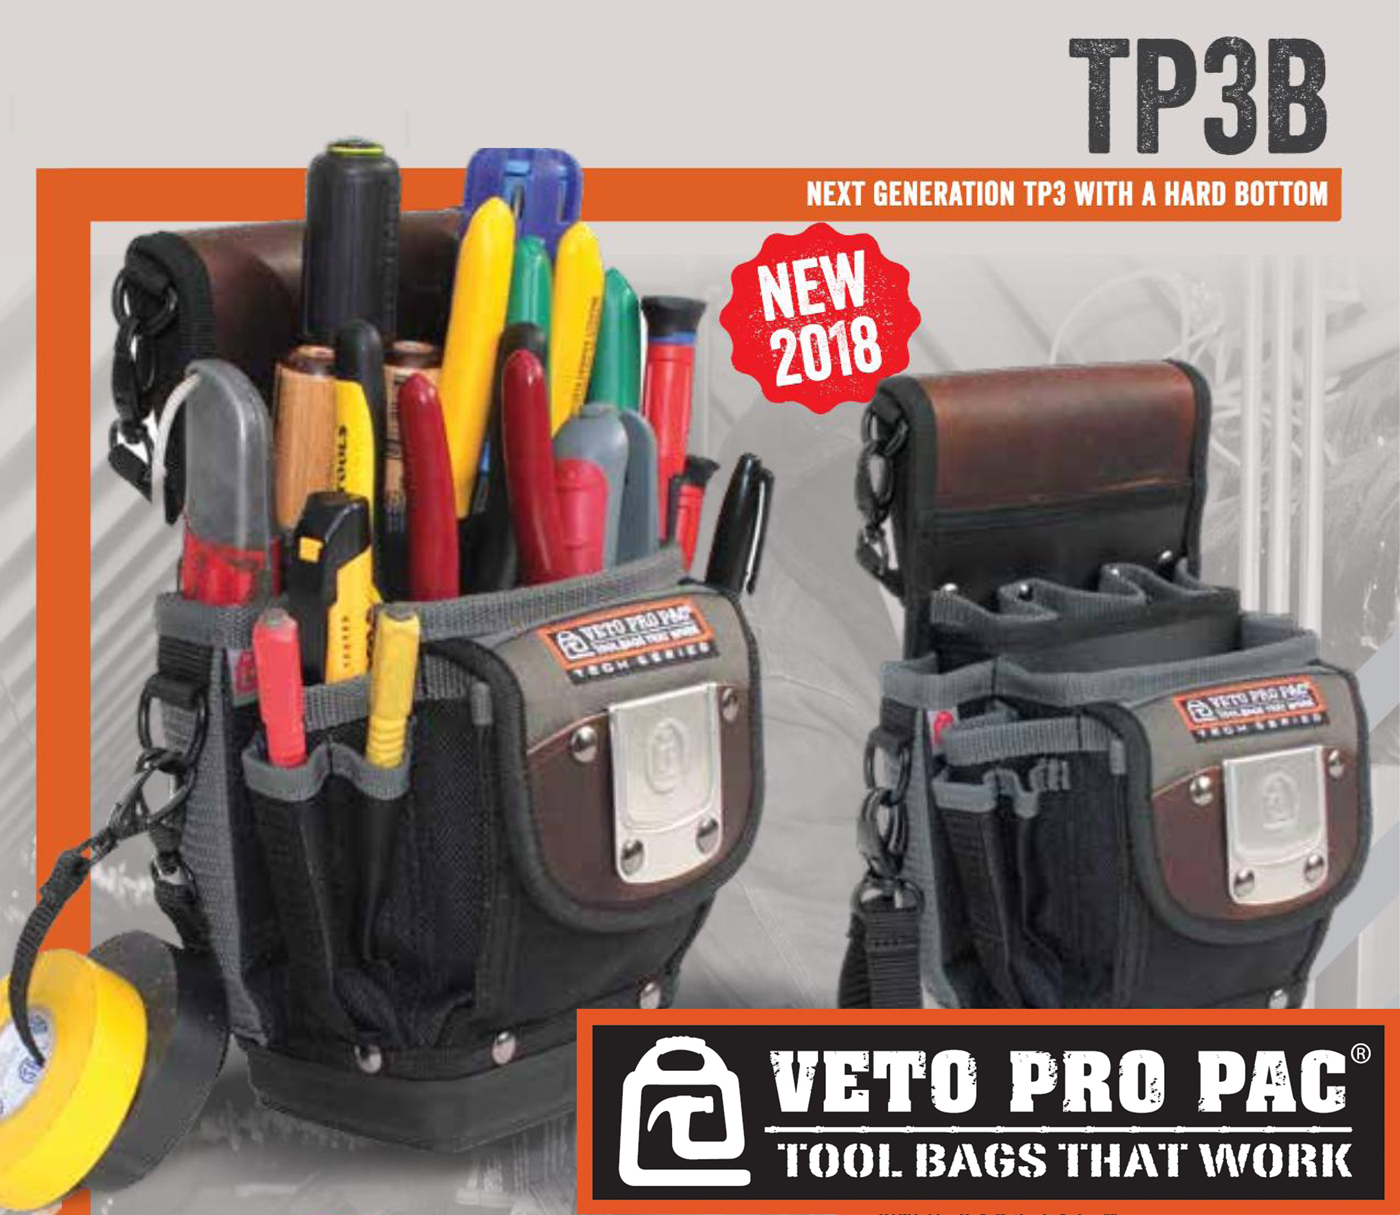 Veto Pro Pac TP3B